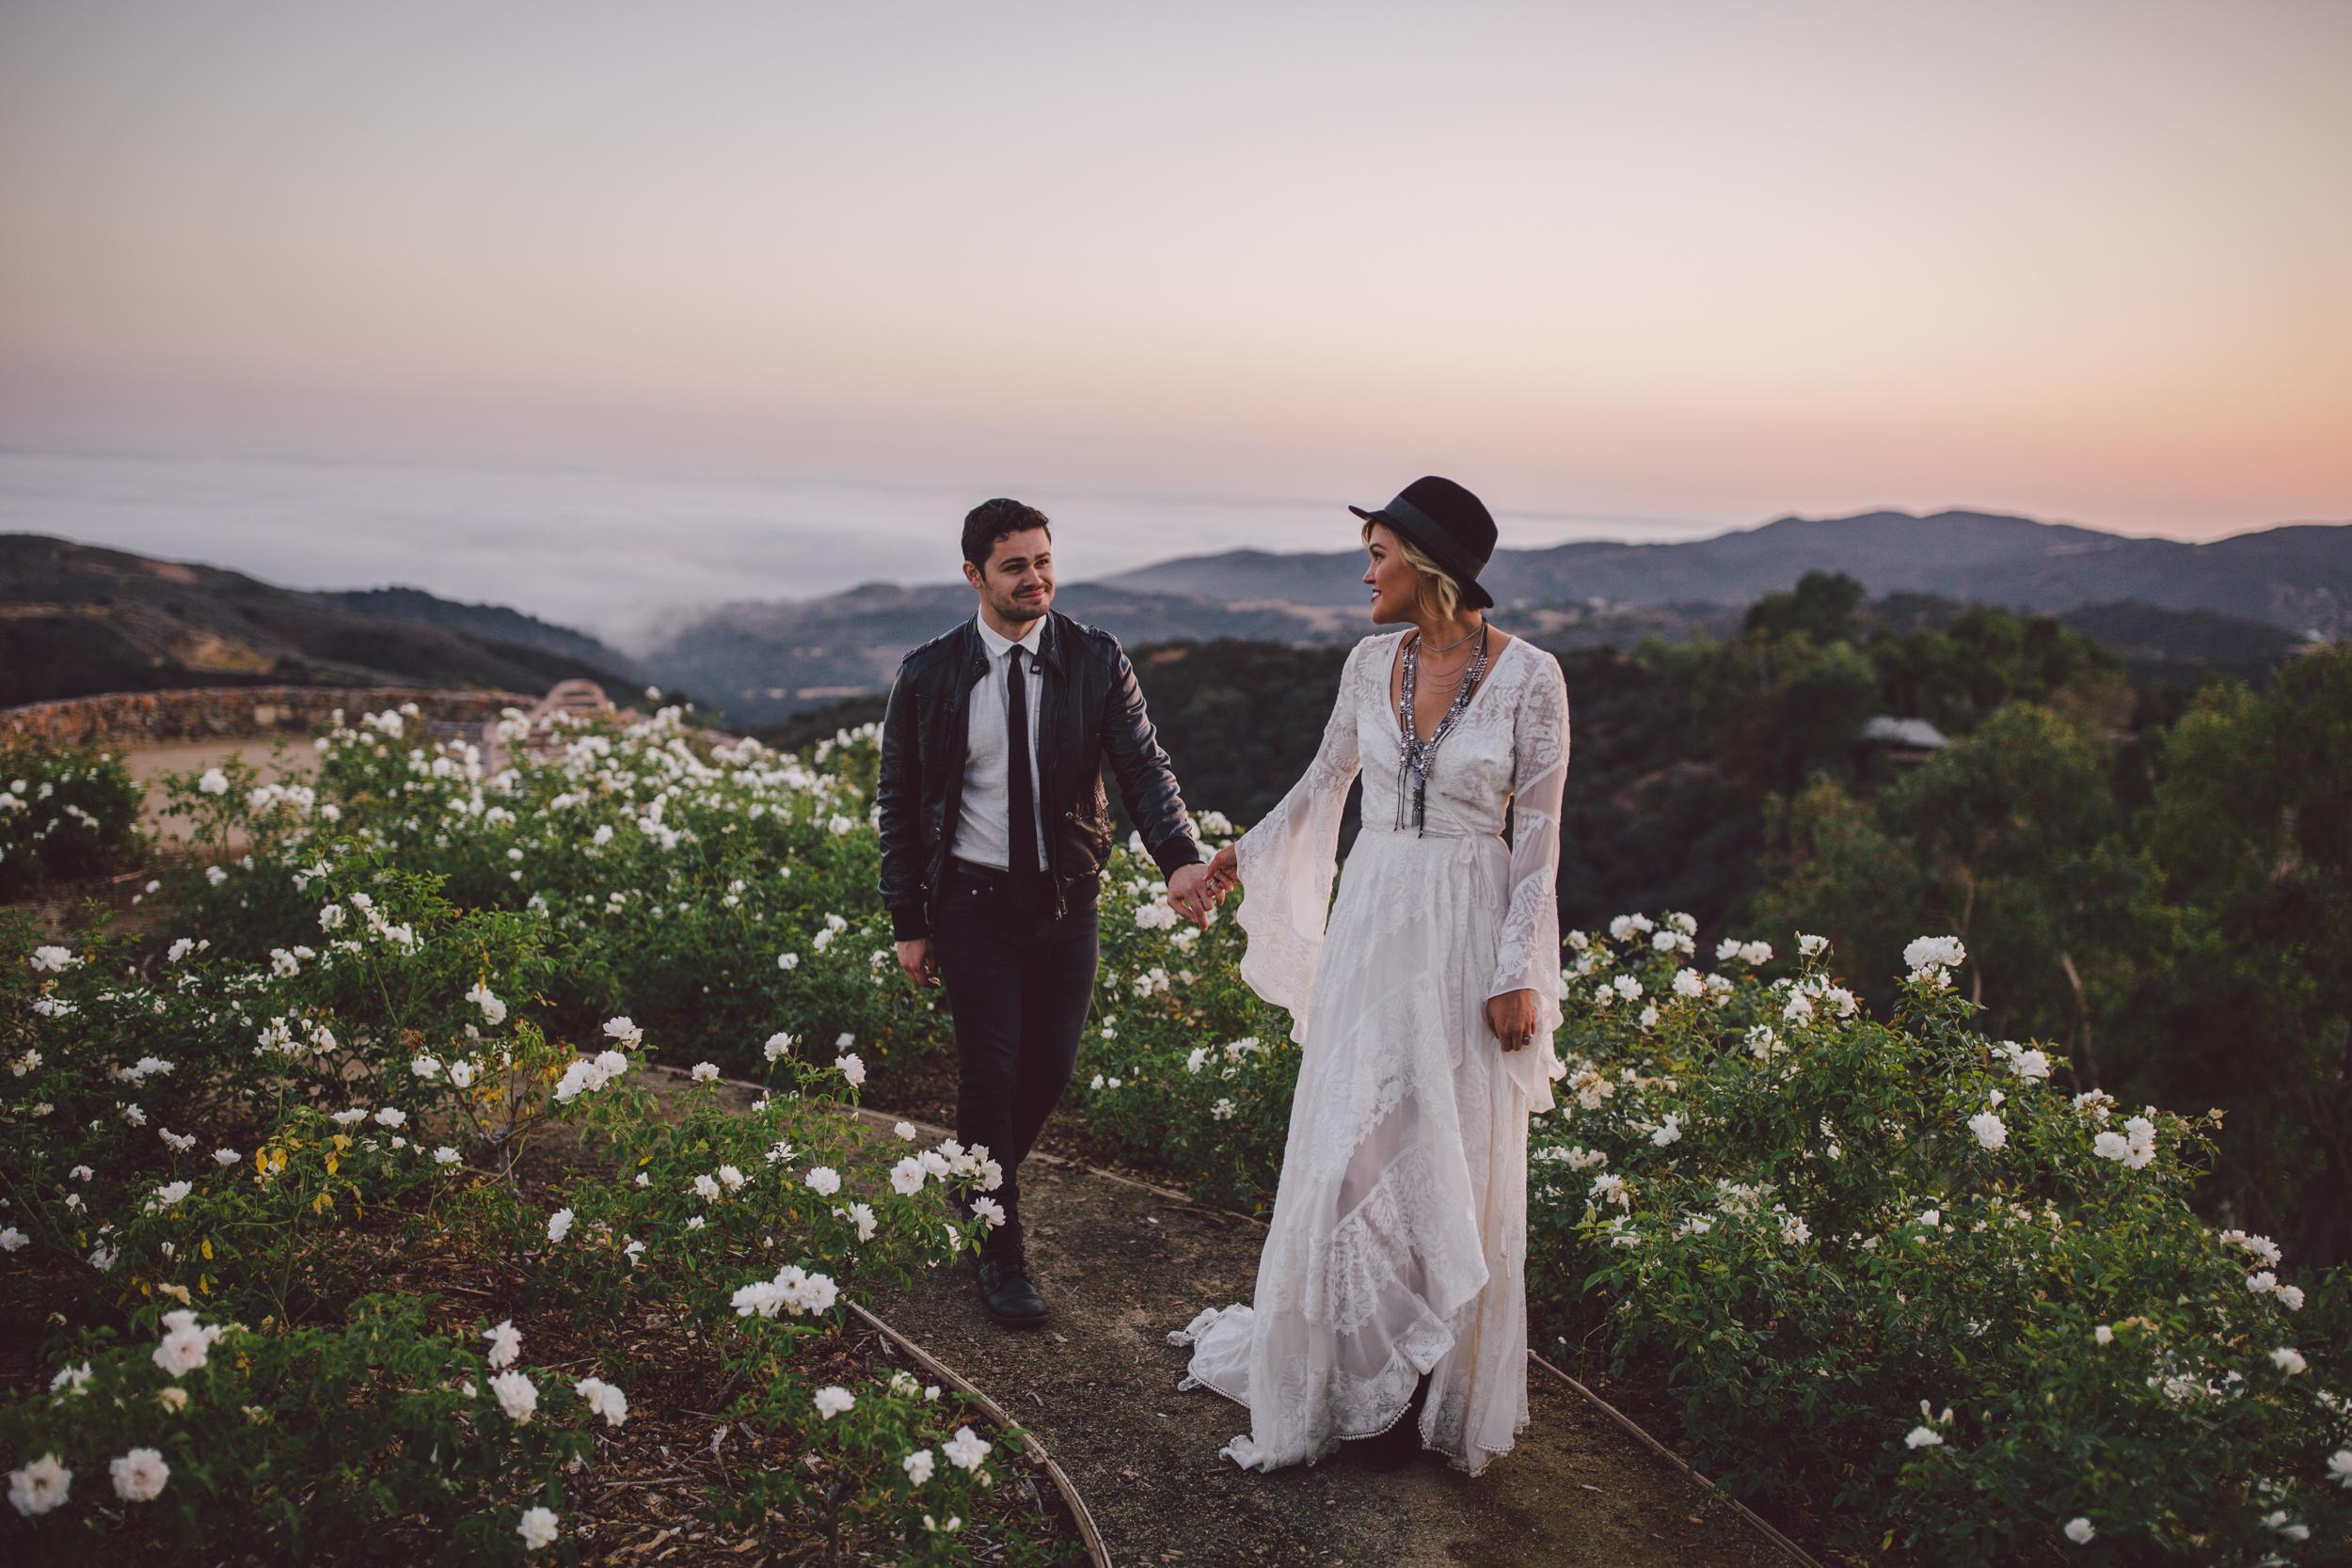 stonewall ranch-sunset-malibu-wedding-portraits-freepeople-bride-leather jacket